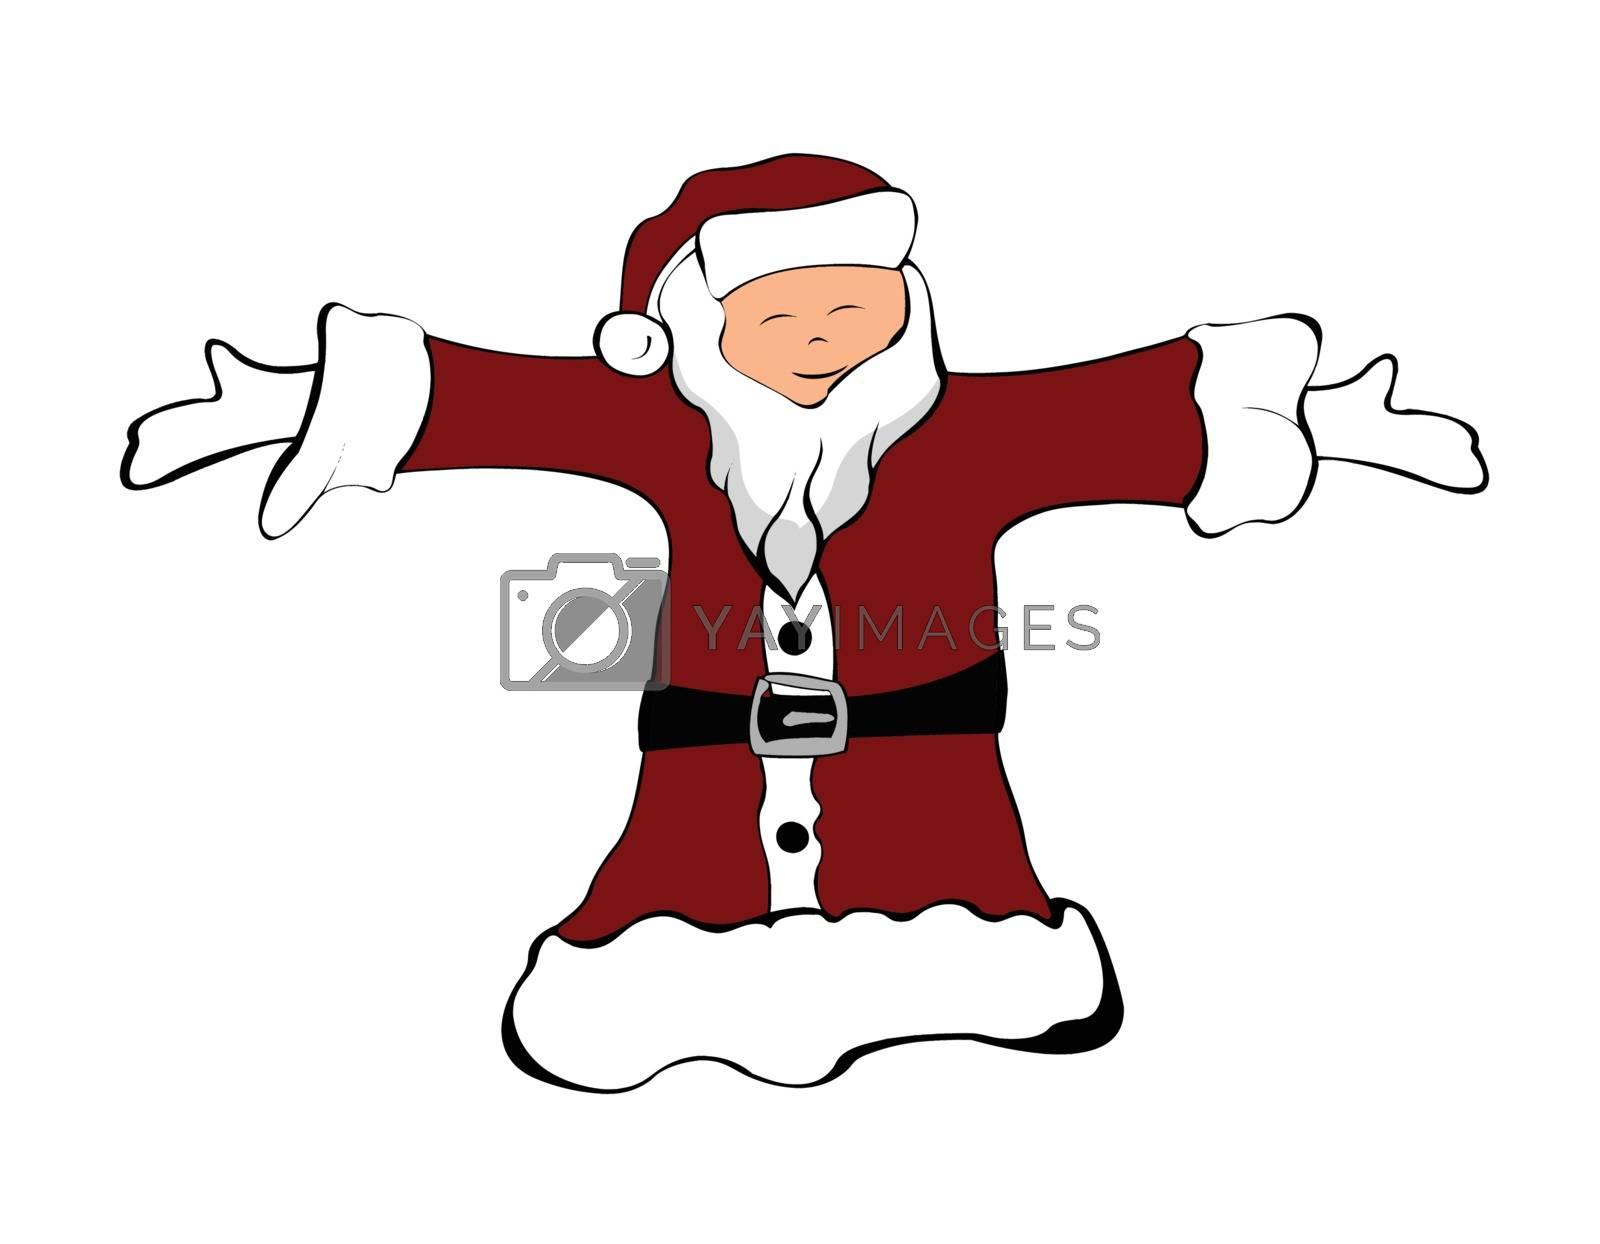 Santa Claus illustration isolated on white